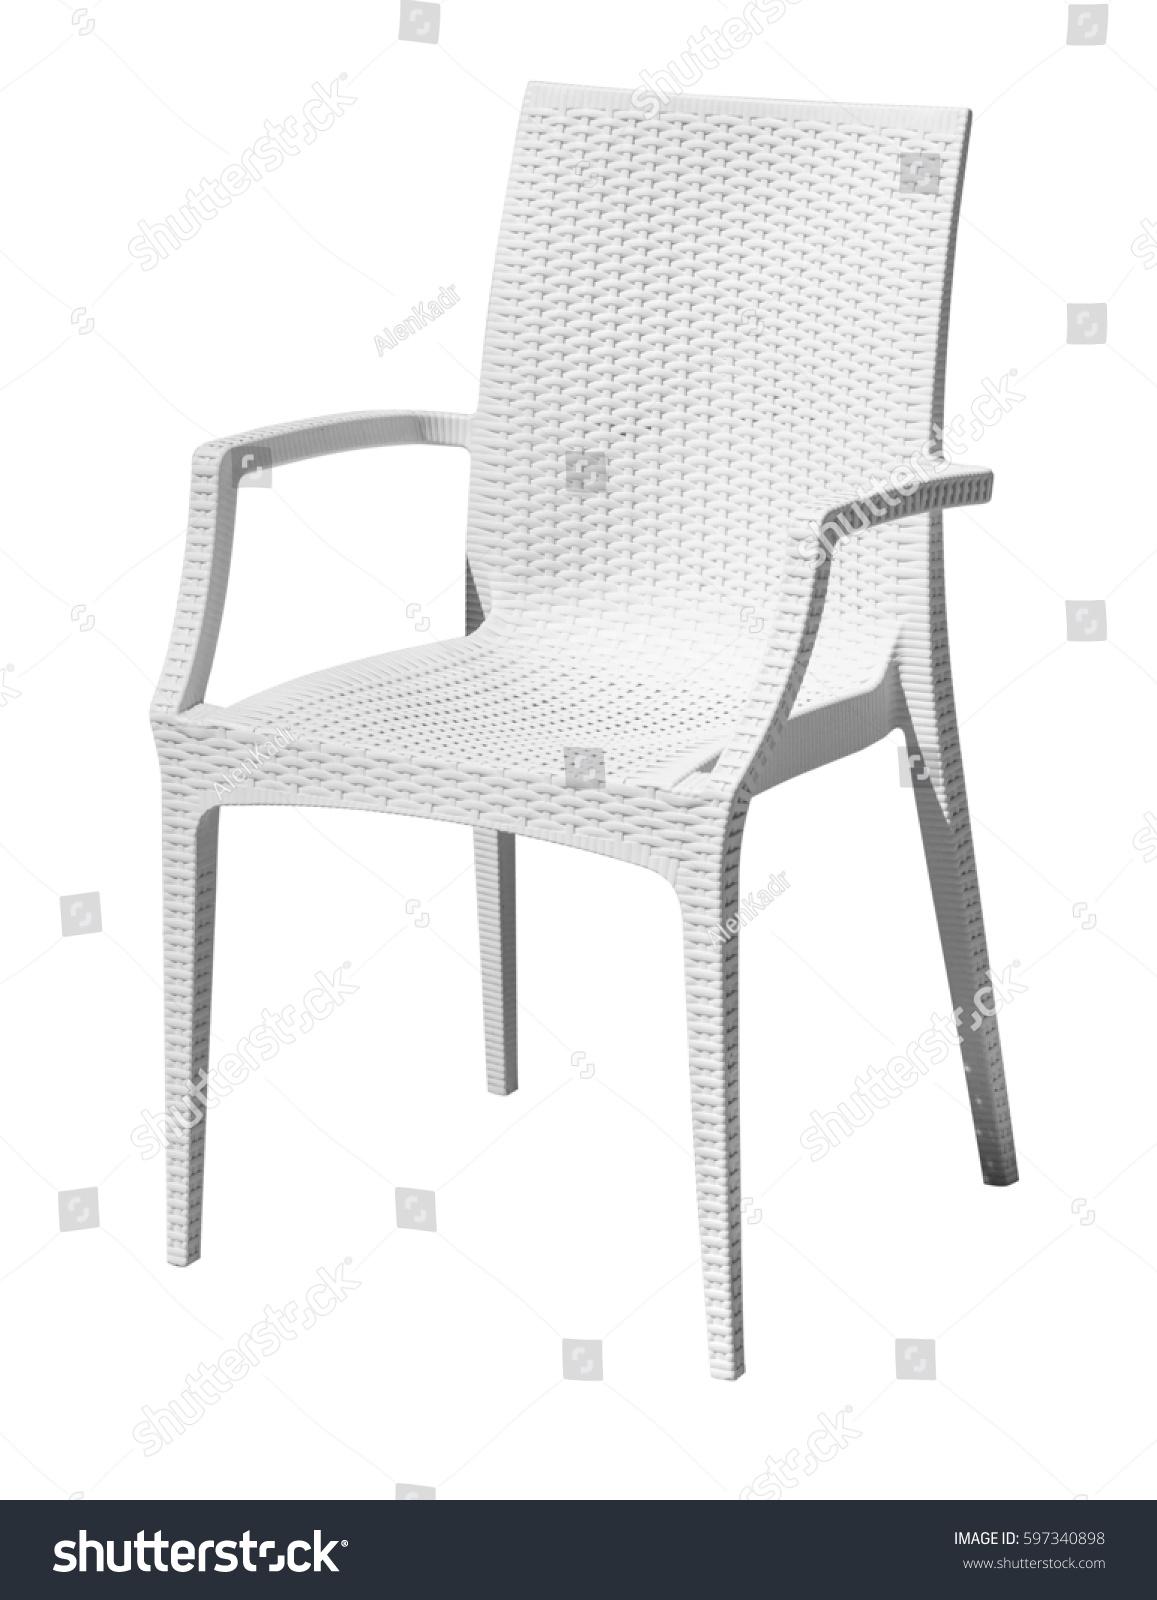 White plastic chair isolated on white stock photo 597340898 shutterstock - Witte plastic stoel ...